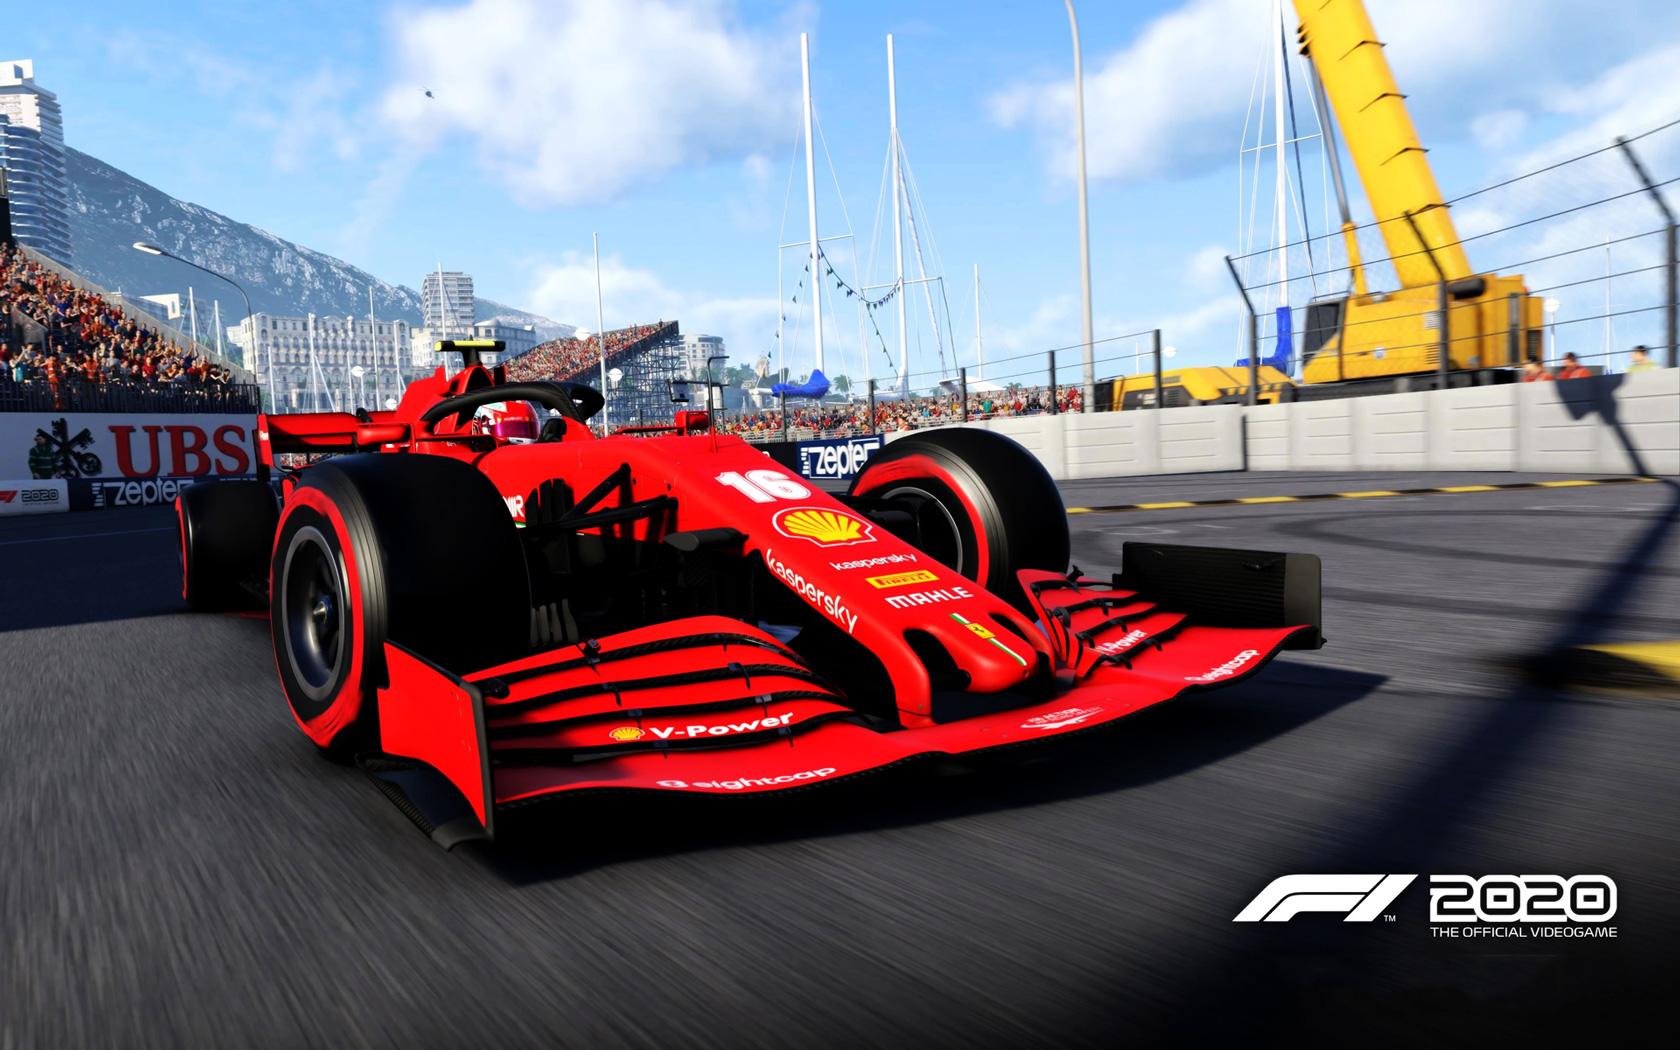 F1 2020 Wallpaper in 1680x1050